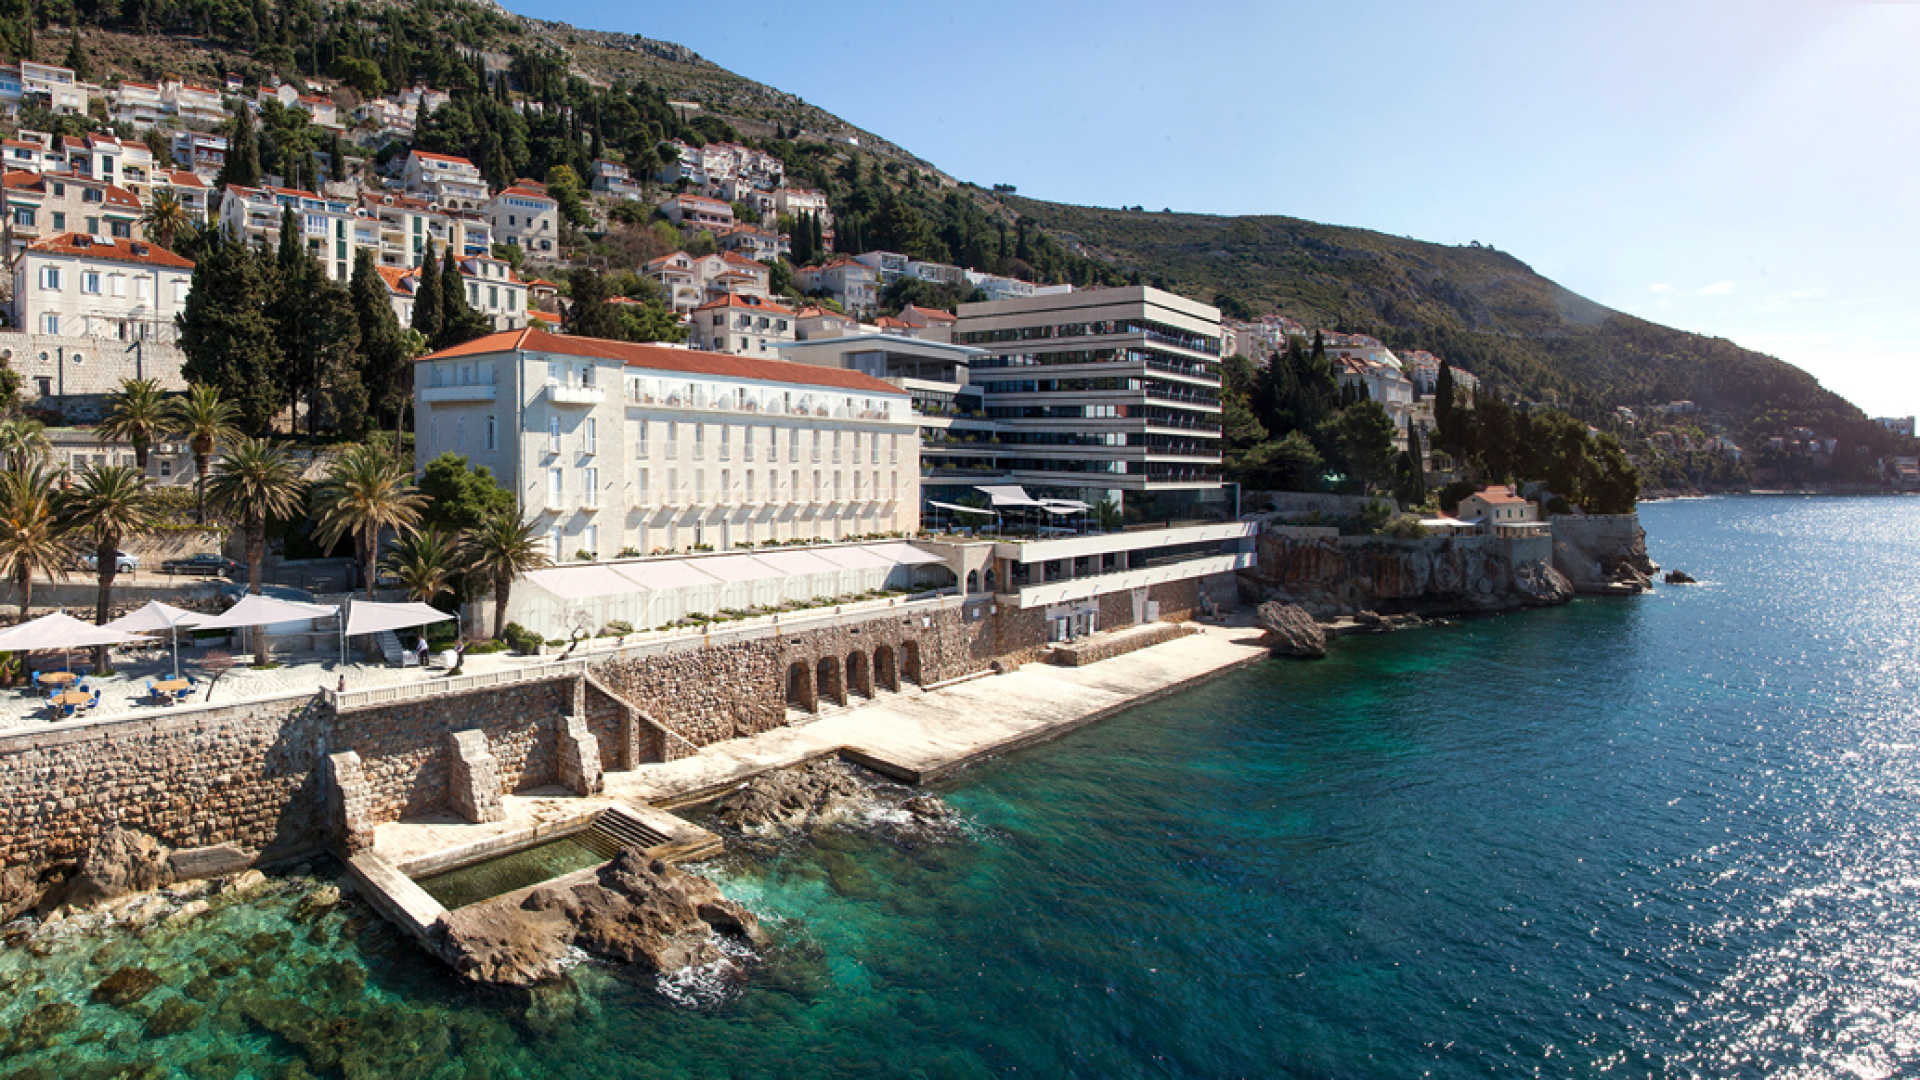 http://www.kuoni.co.uk/croatia/hotels/hotel-excelsior-dubrovnik